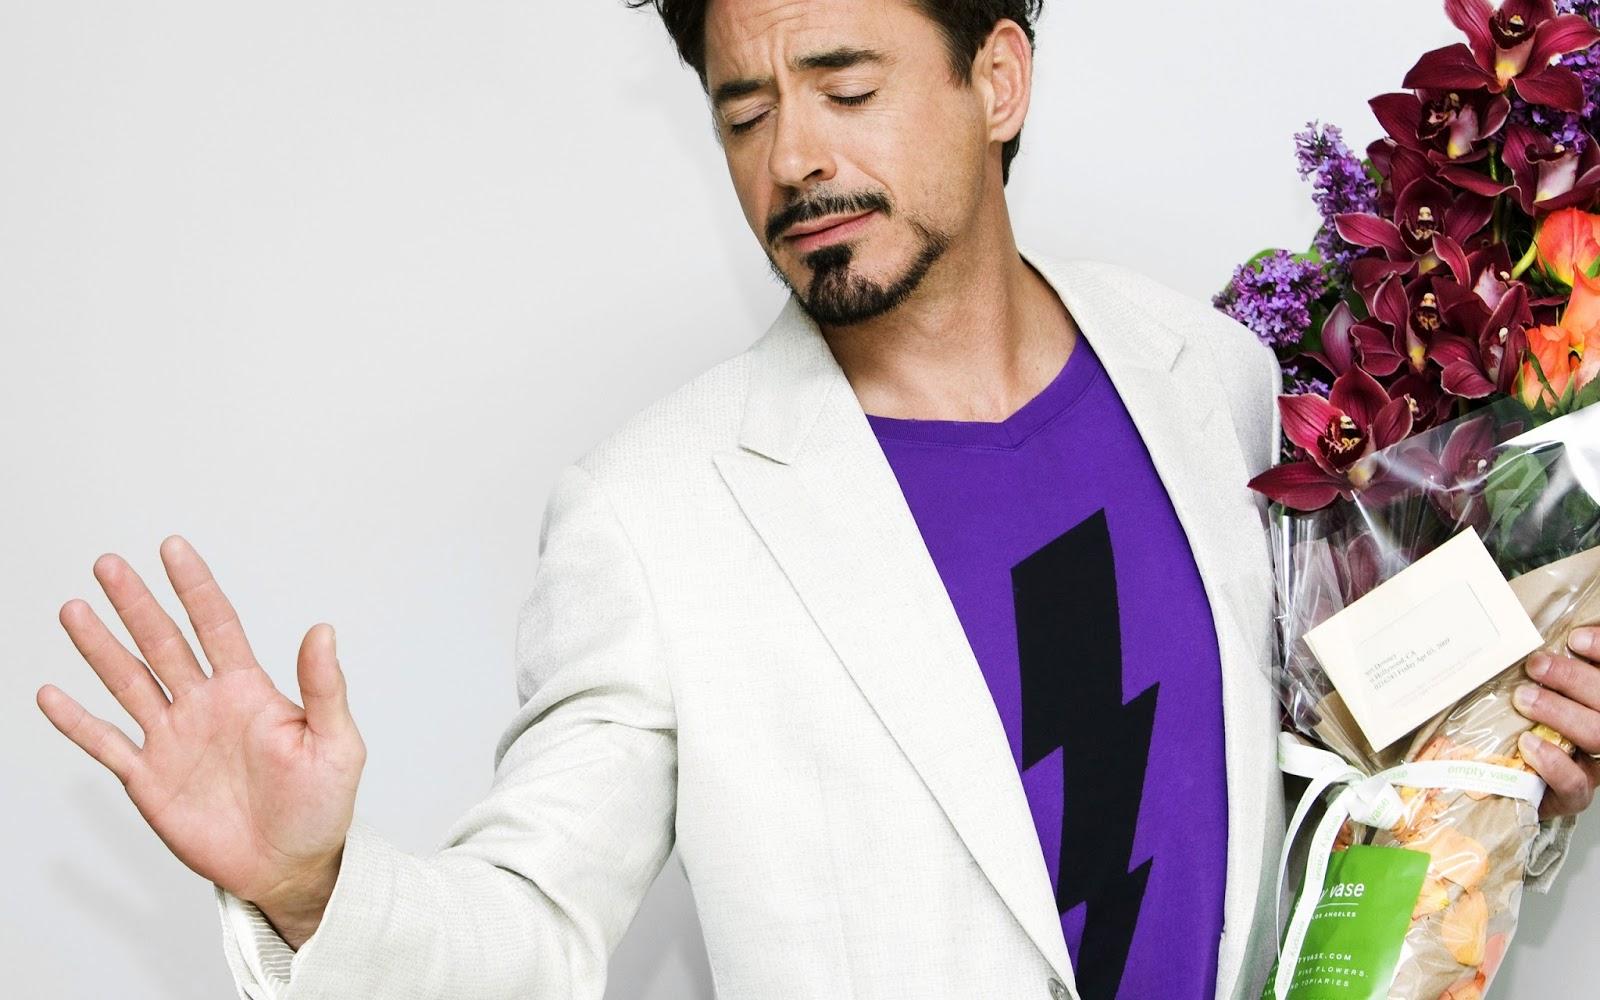 Robert Downey Jr Hd Wallpapers